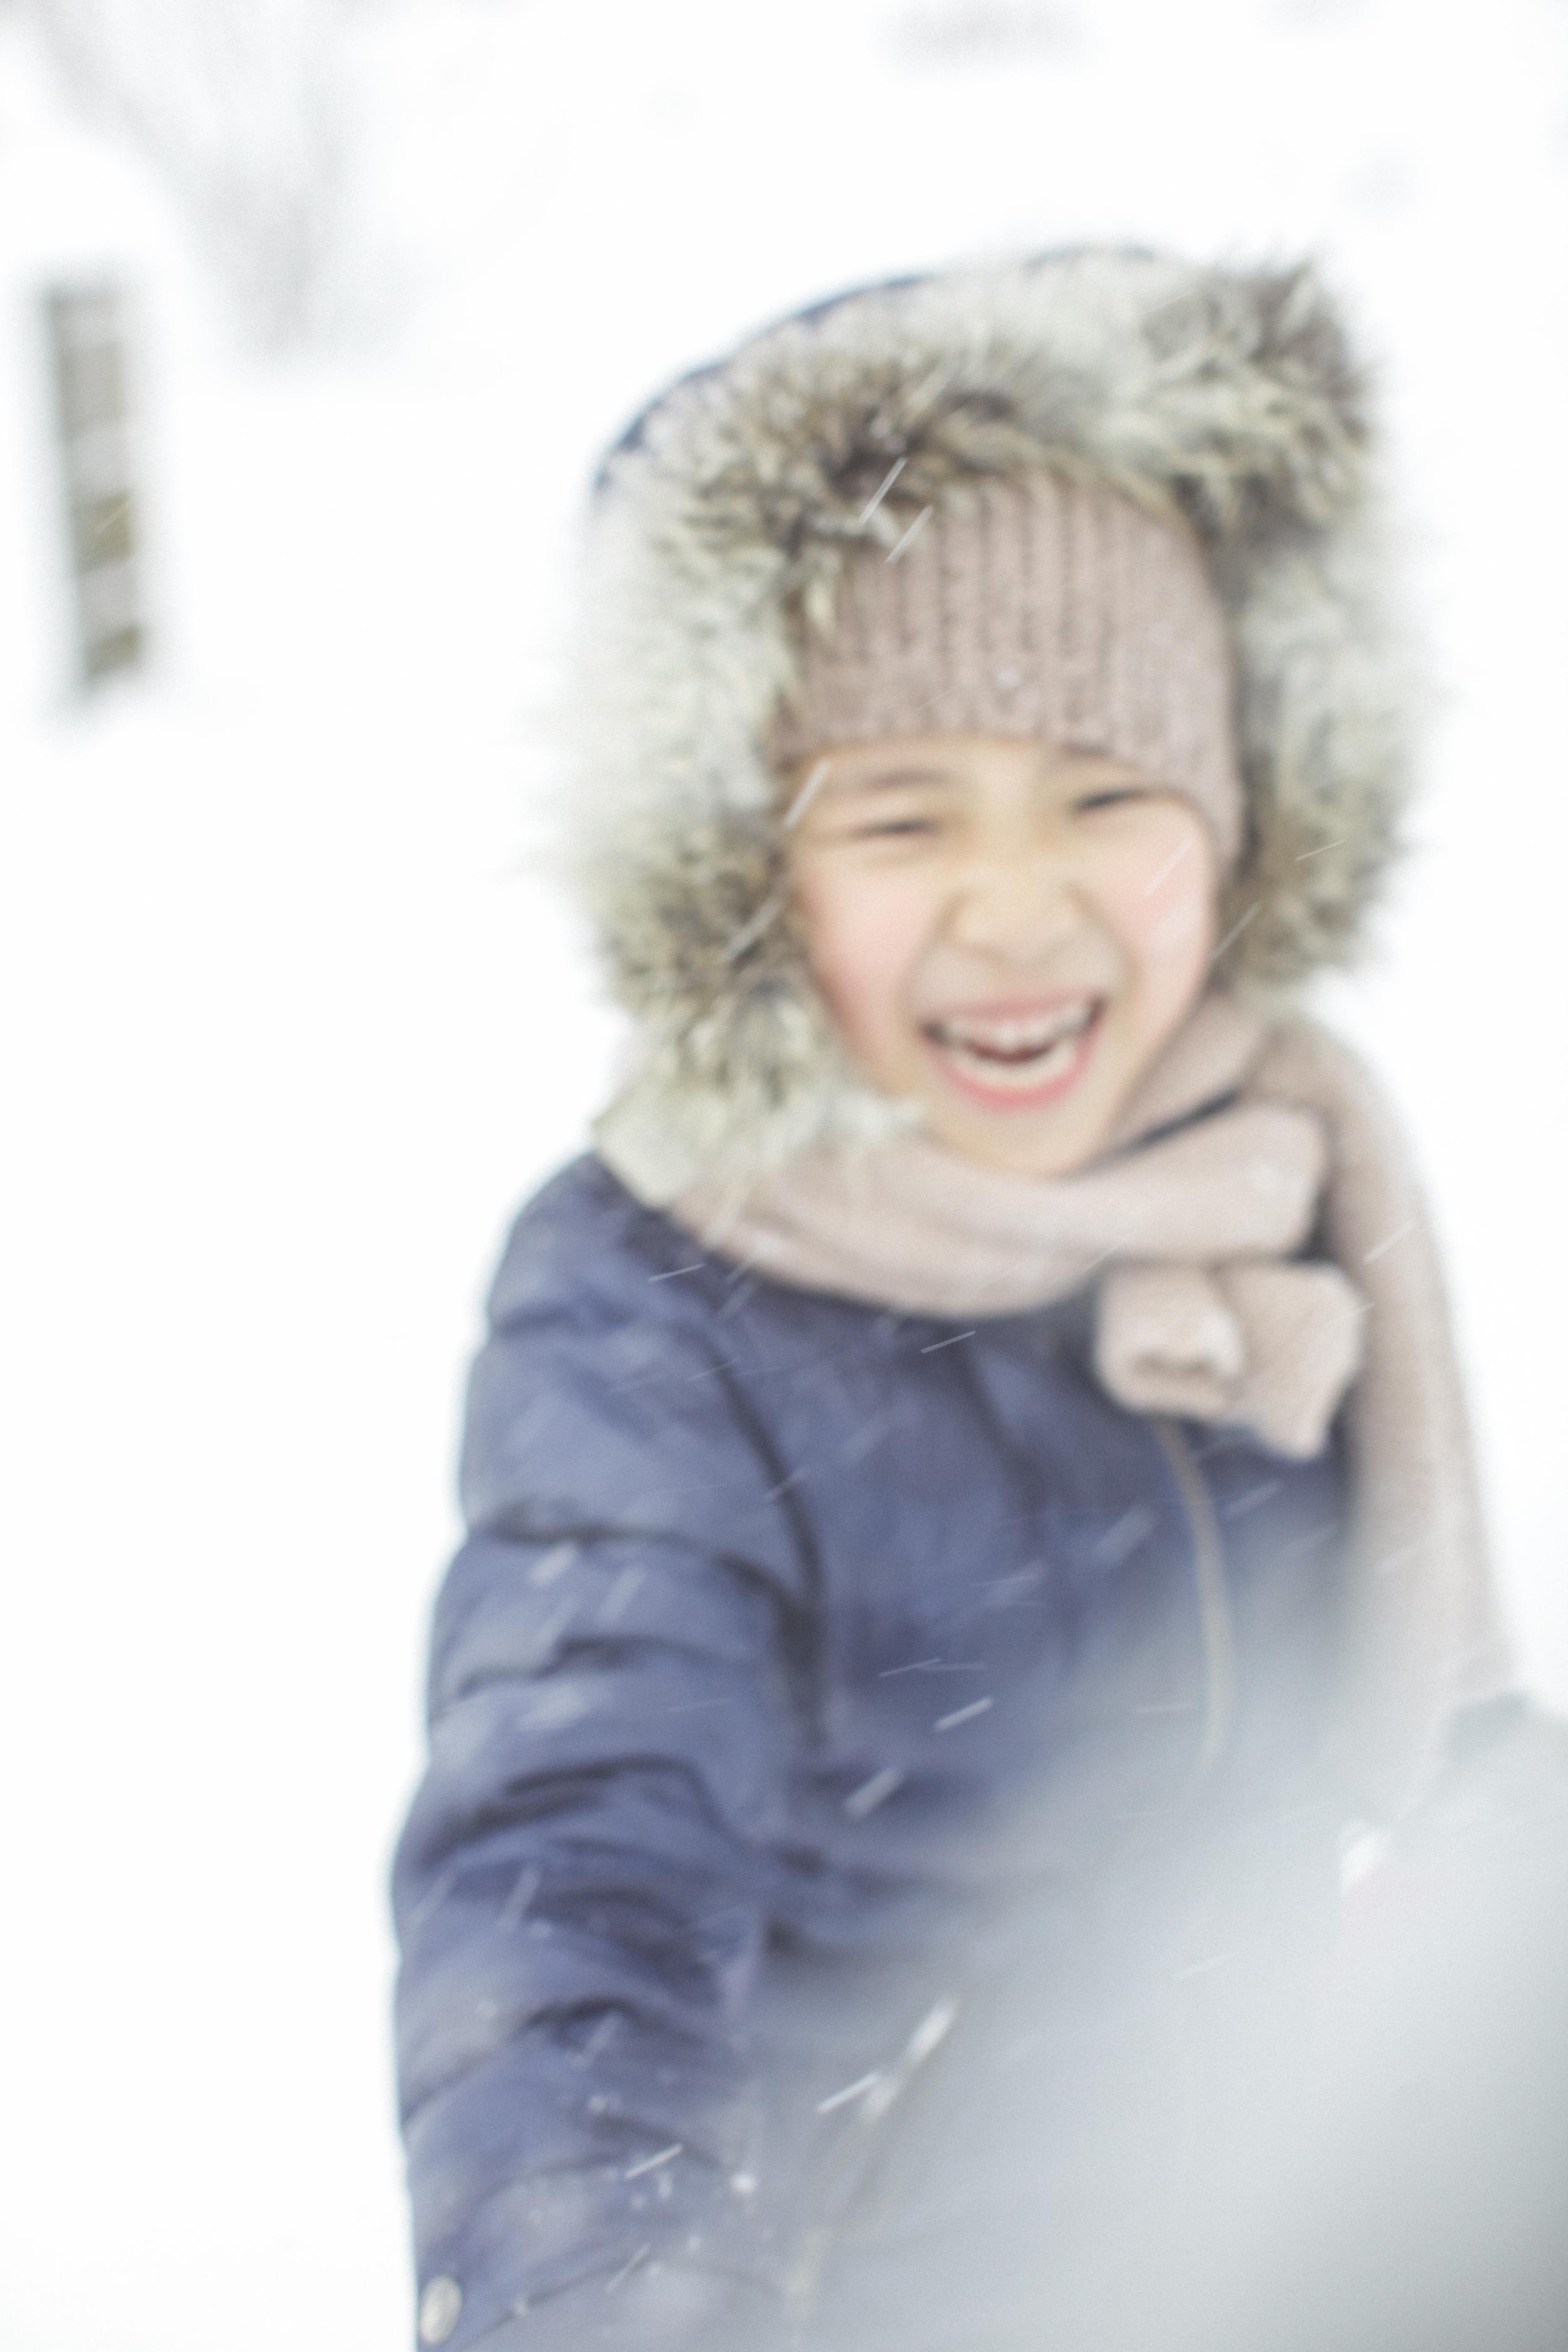 l deng chicago winterstrom blizzard millenium park snowball fight maggie daley ice ribbon -002.jpg